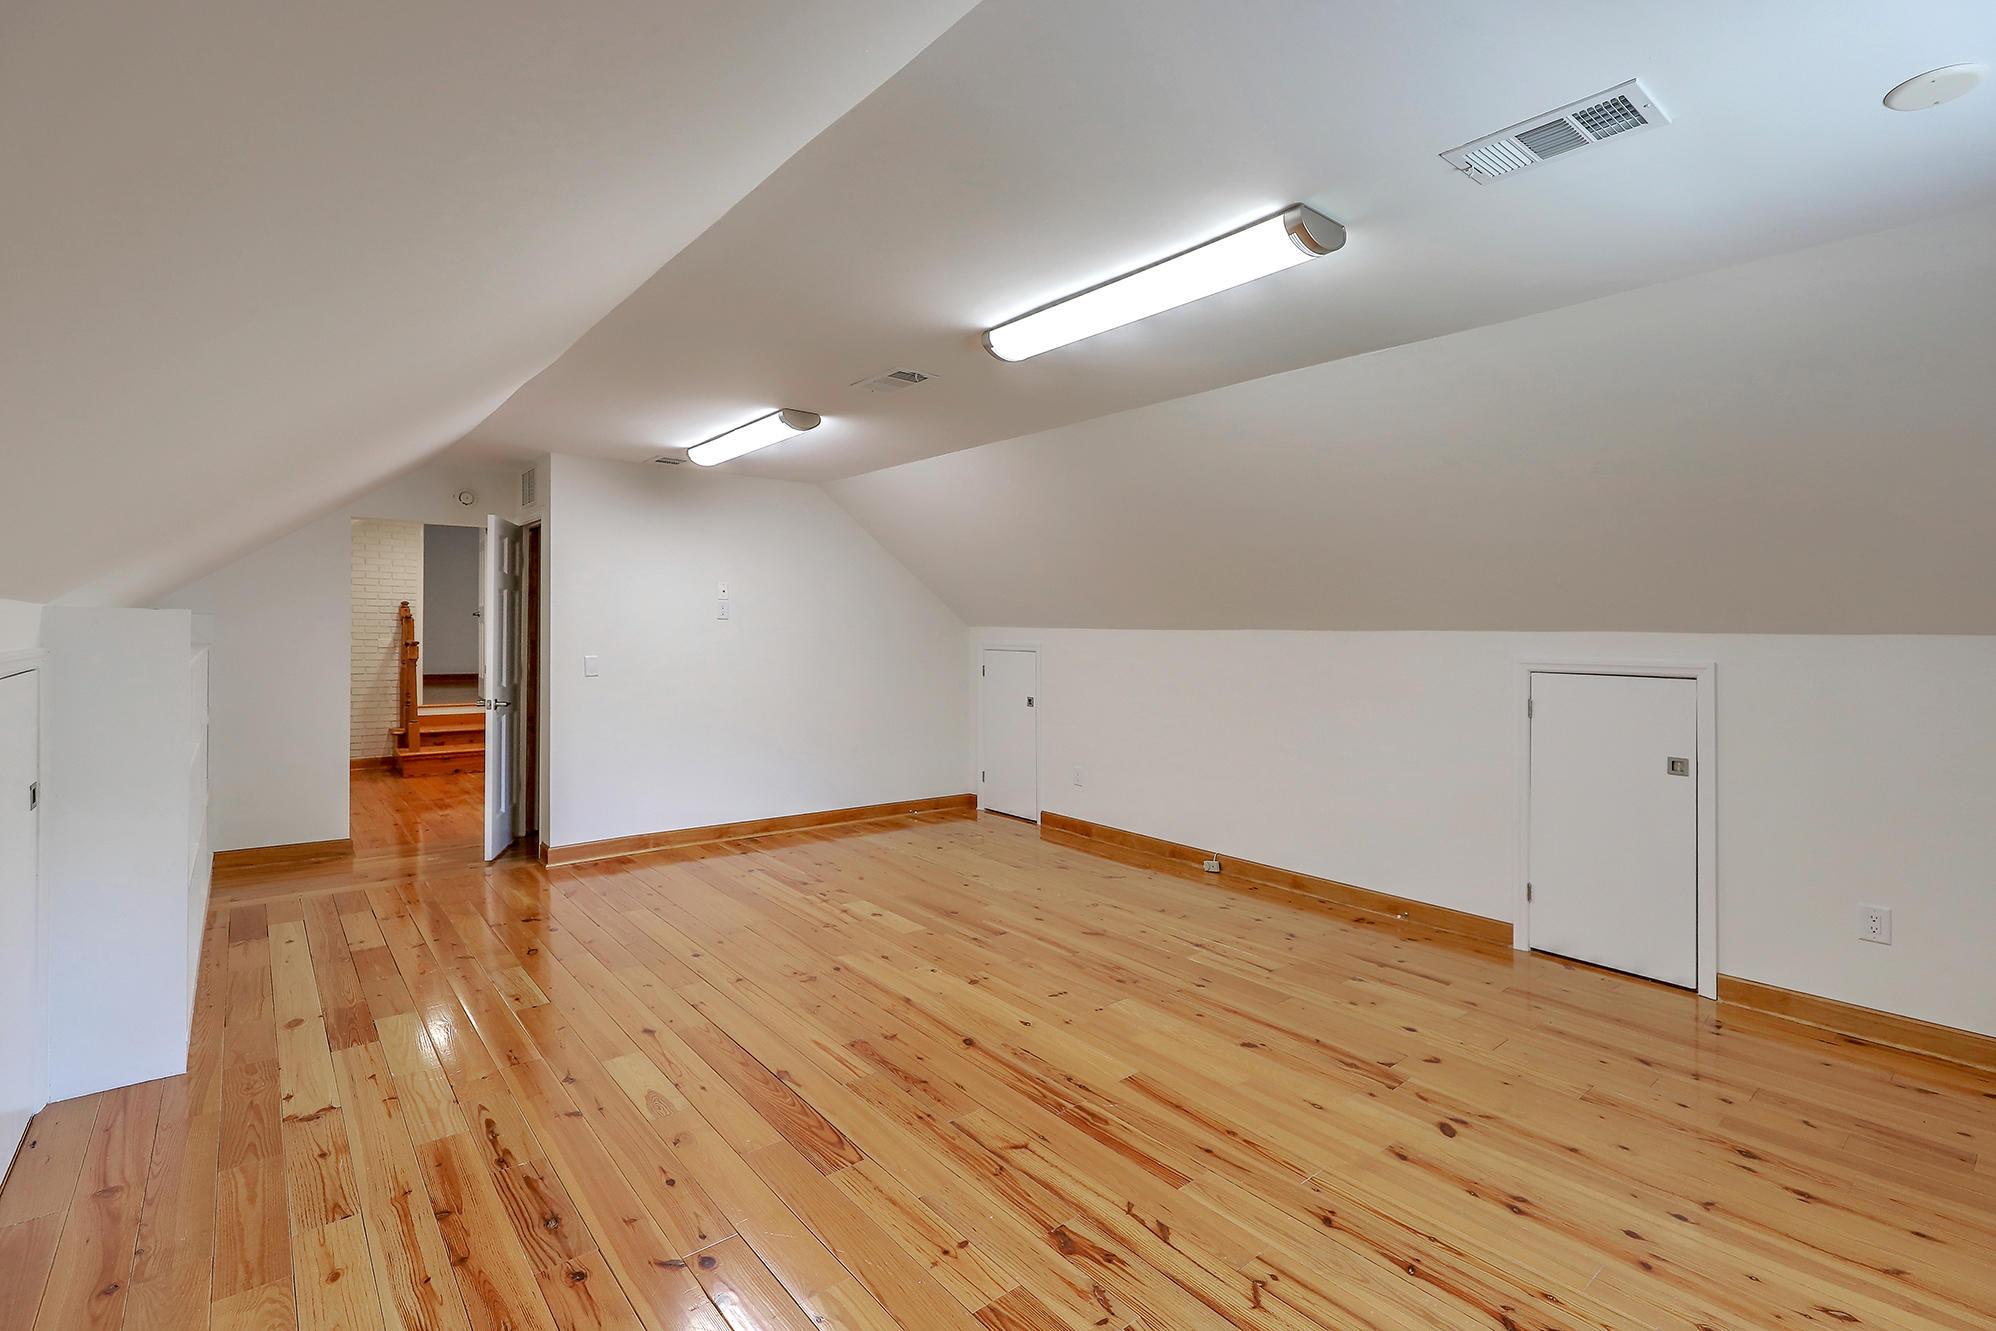 Edgewater Park Homes For Sale - 1413 Edsent, Charleston, SC - 28